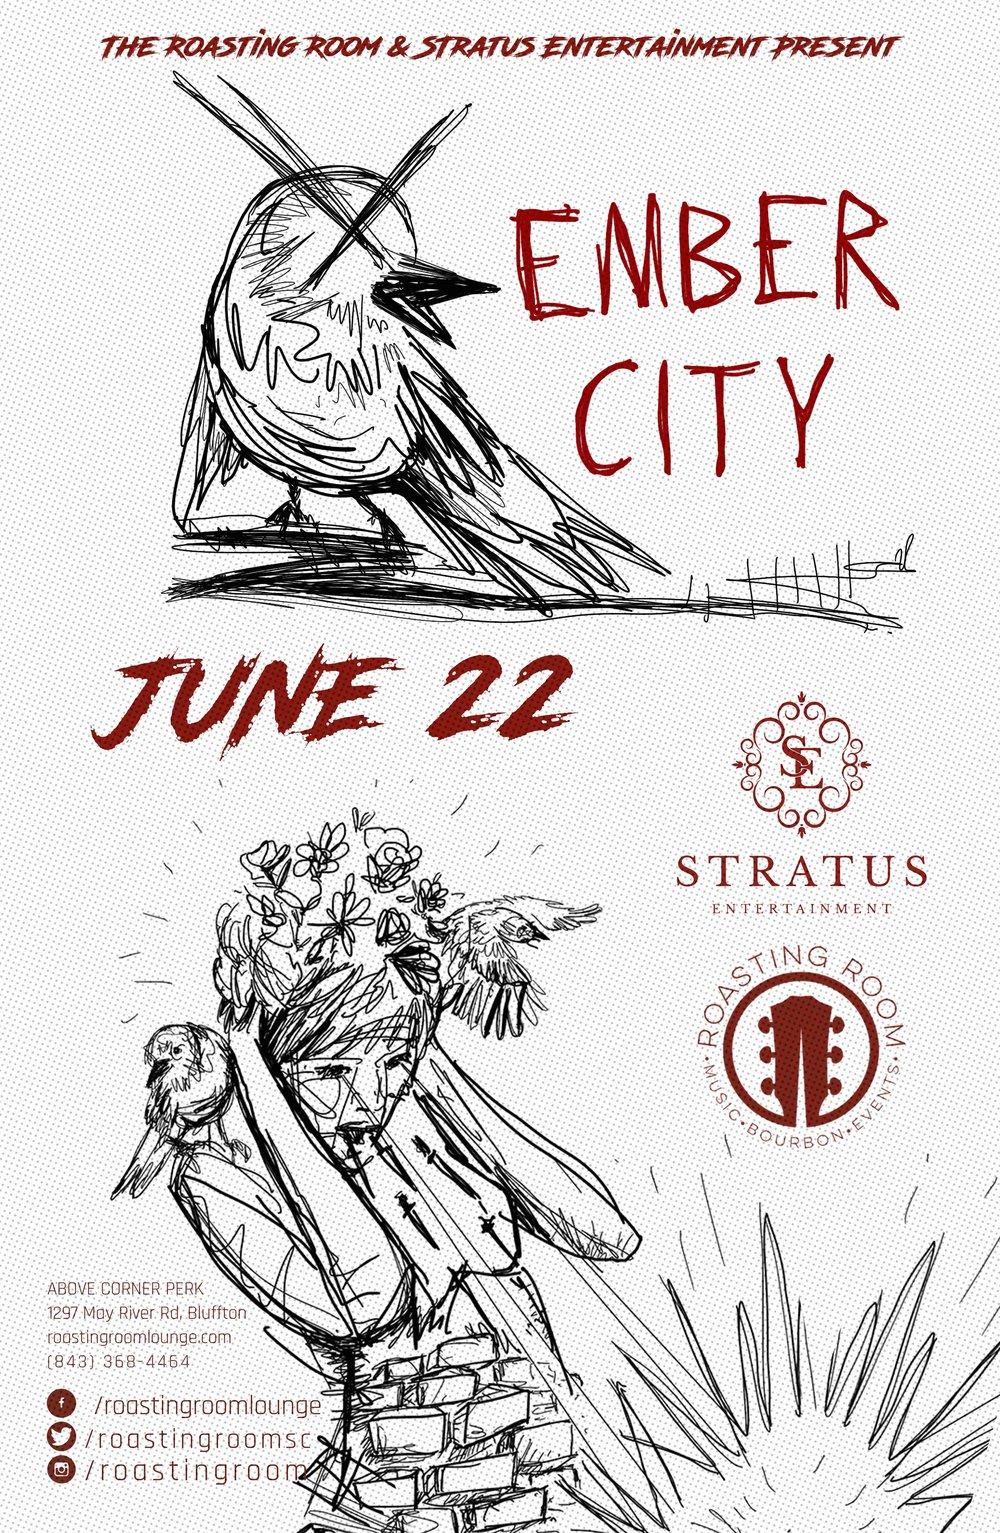 06.22 Ember City_web.jpg